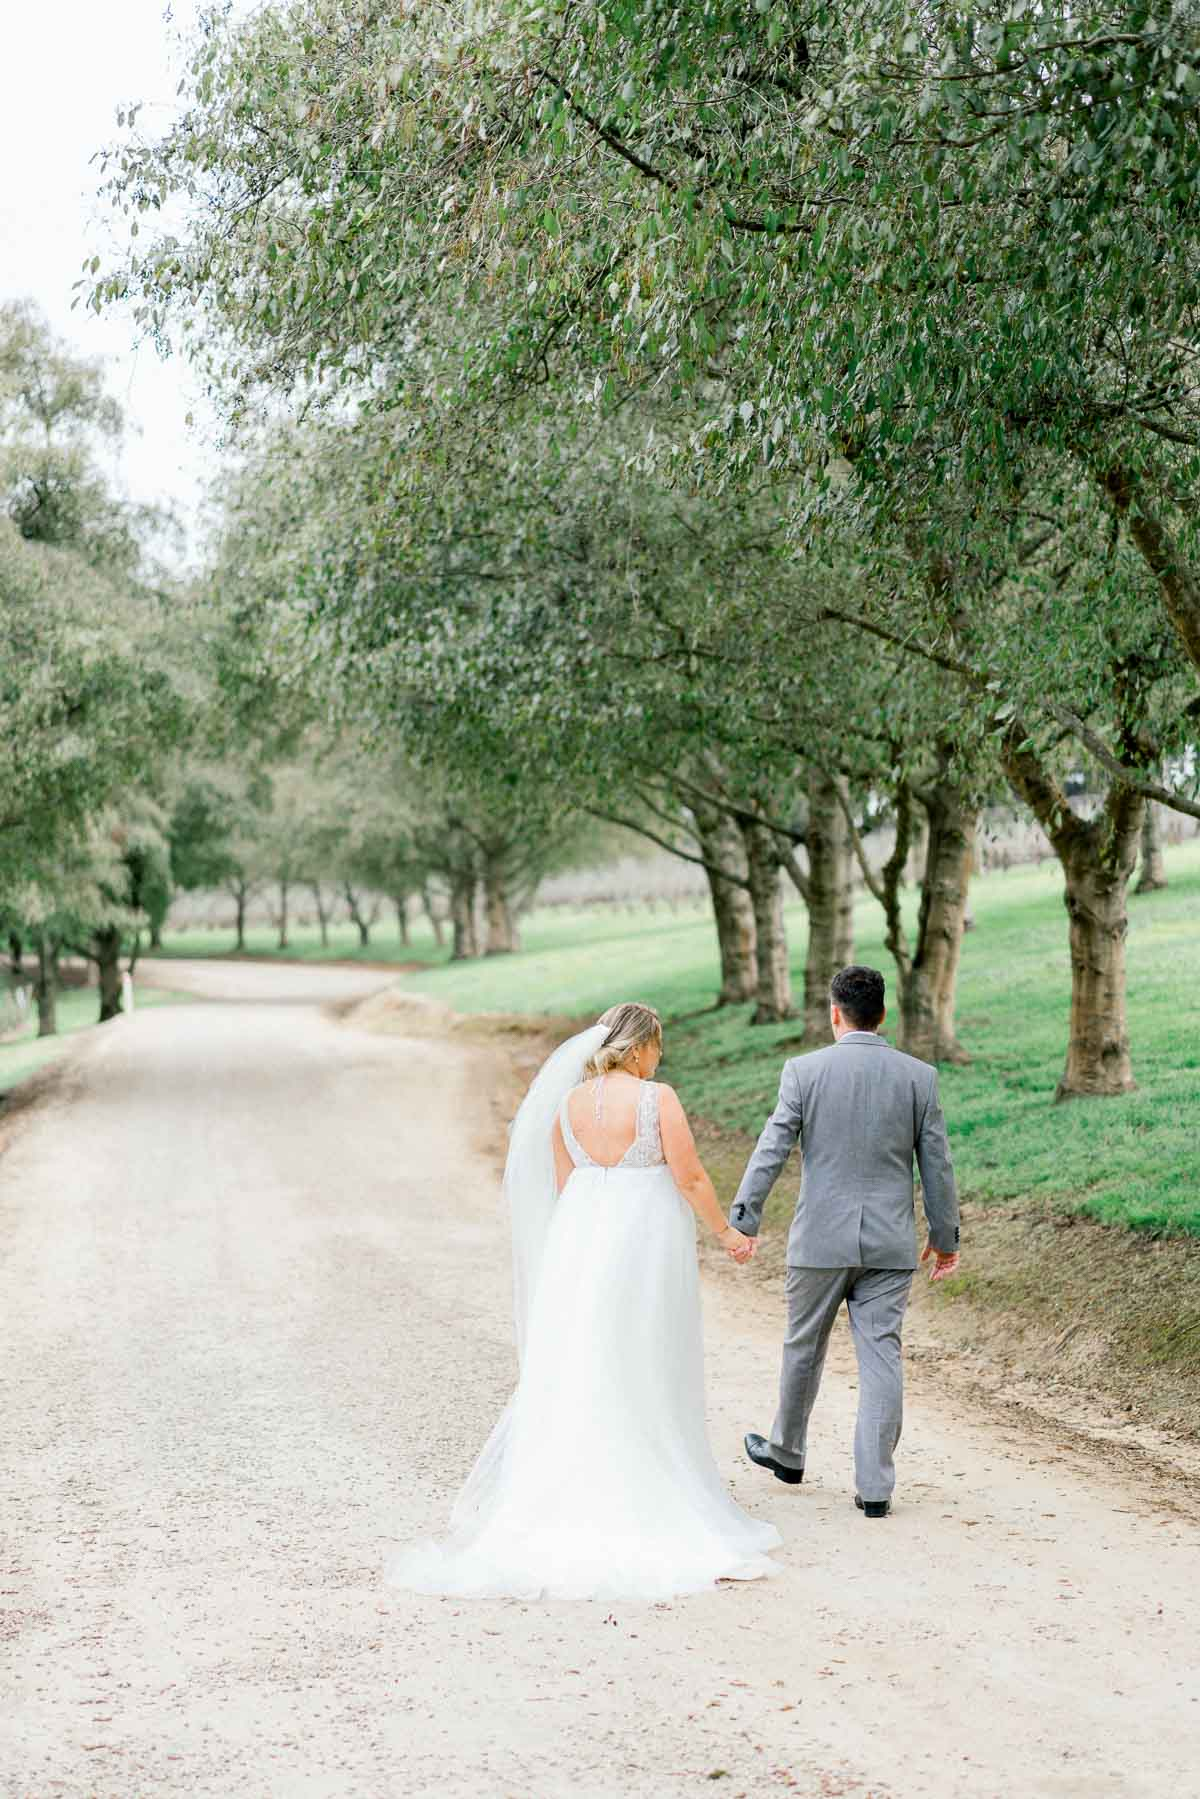 lindenderry-wedding-heart+soul-weddings-amy-alain-03695.jpg